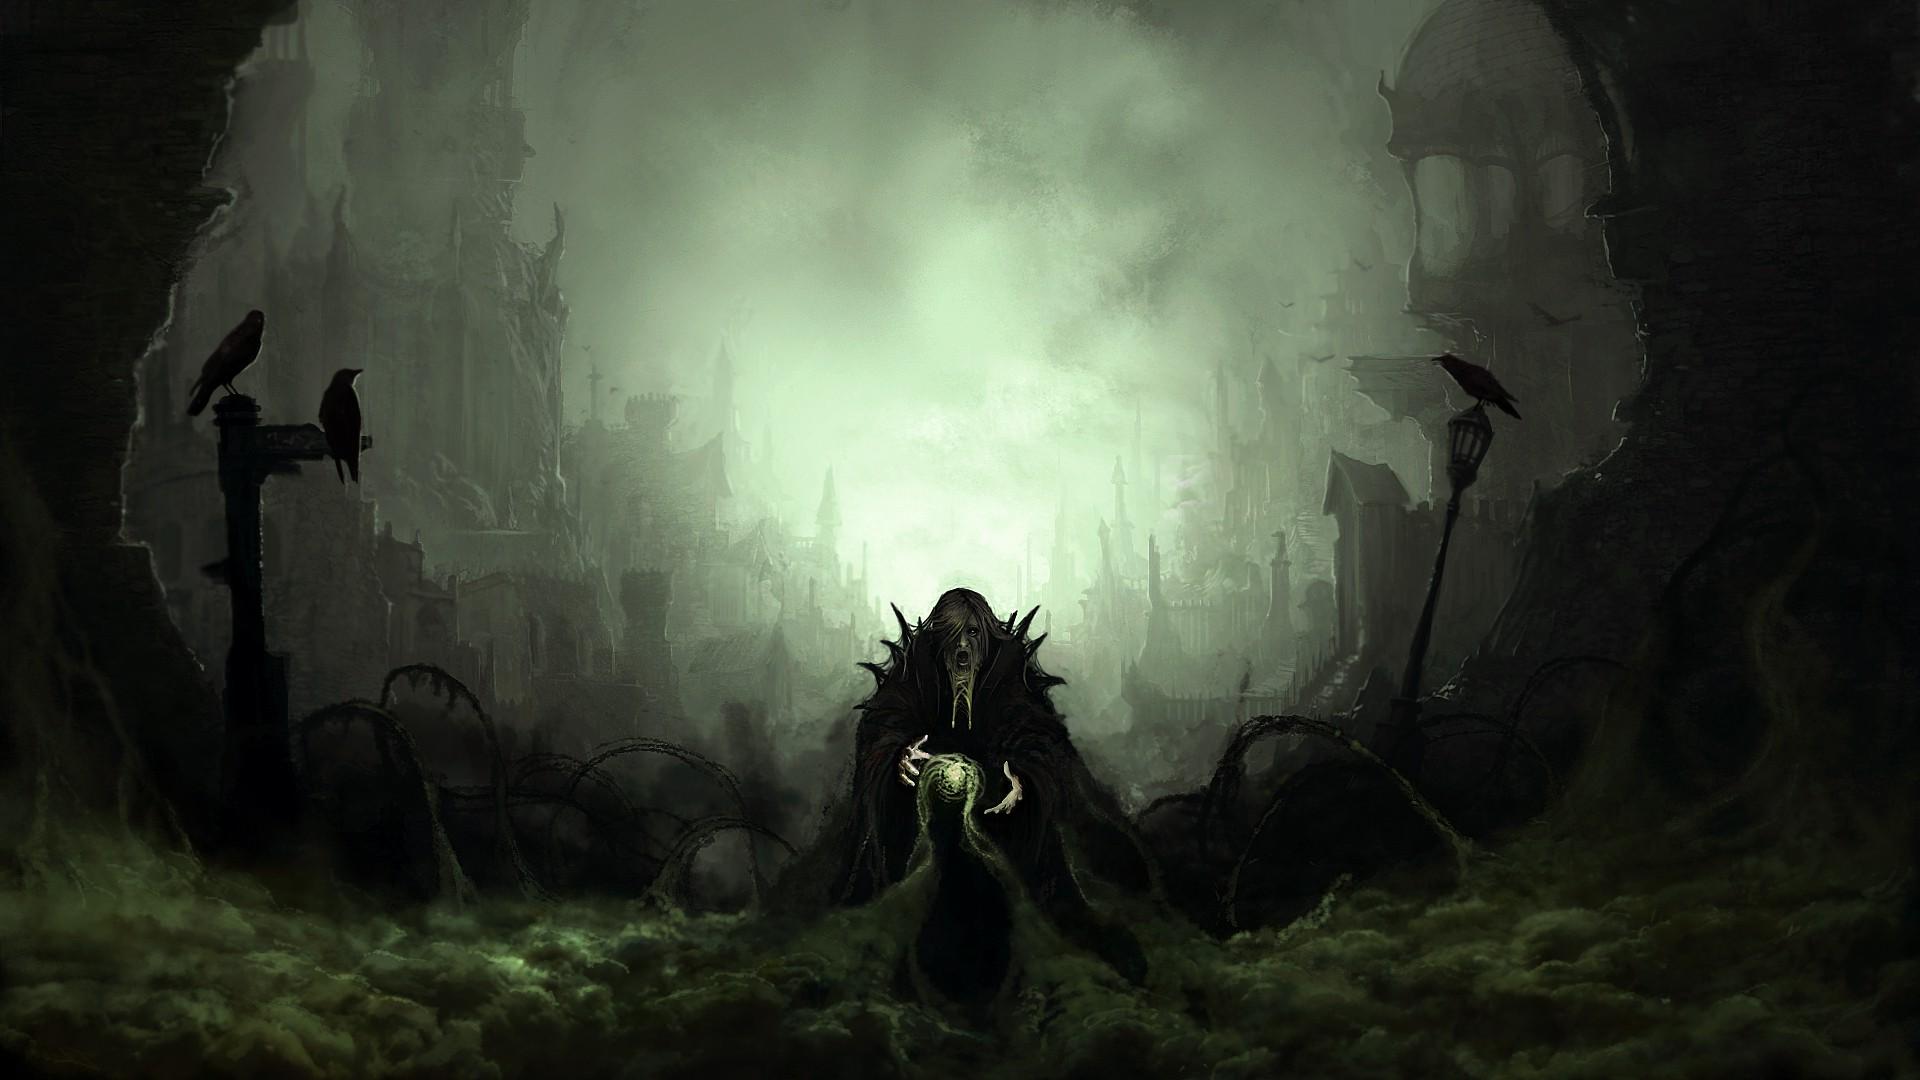 Dark Fantasy Wallpaper 1920x1080 Posted By Sarah Sellers